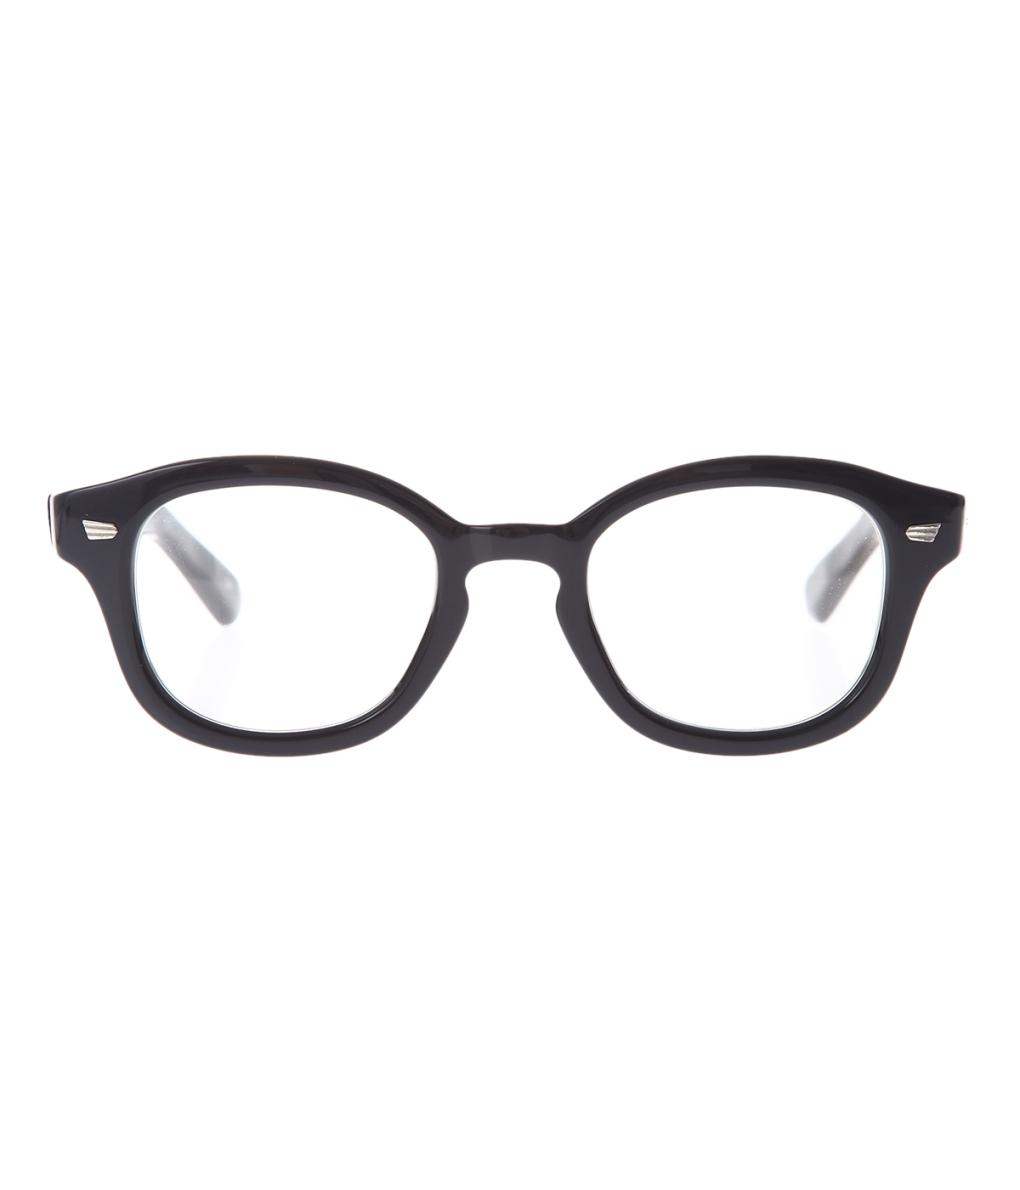 EFFECTOR / エフェクター : CHROMATIC : メガネ 眼鏡 ケース 伊達眼鏡 : CHROMATIC【MUS】